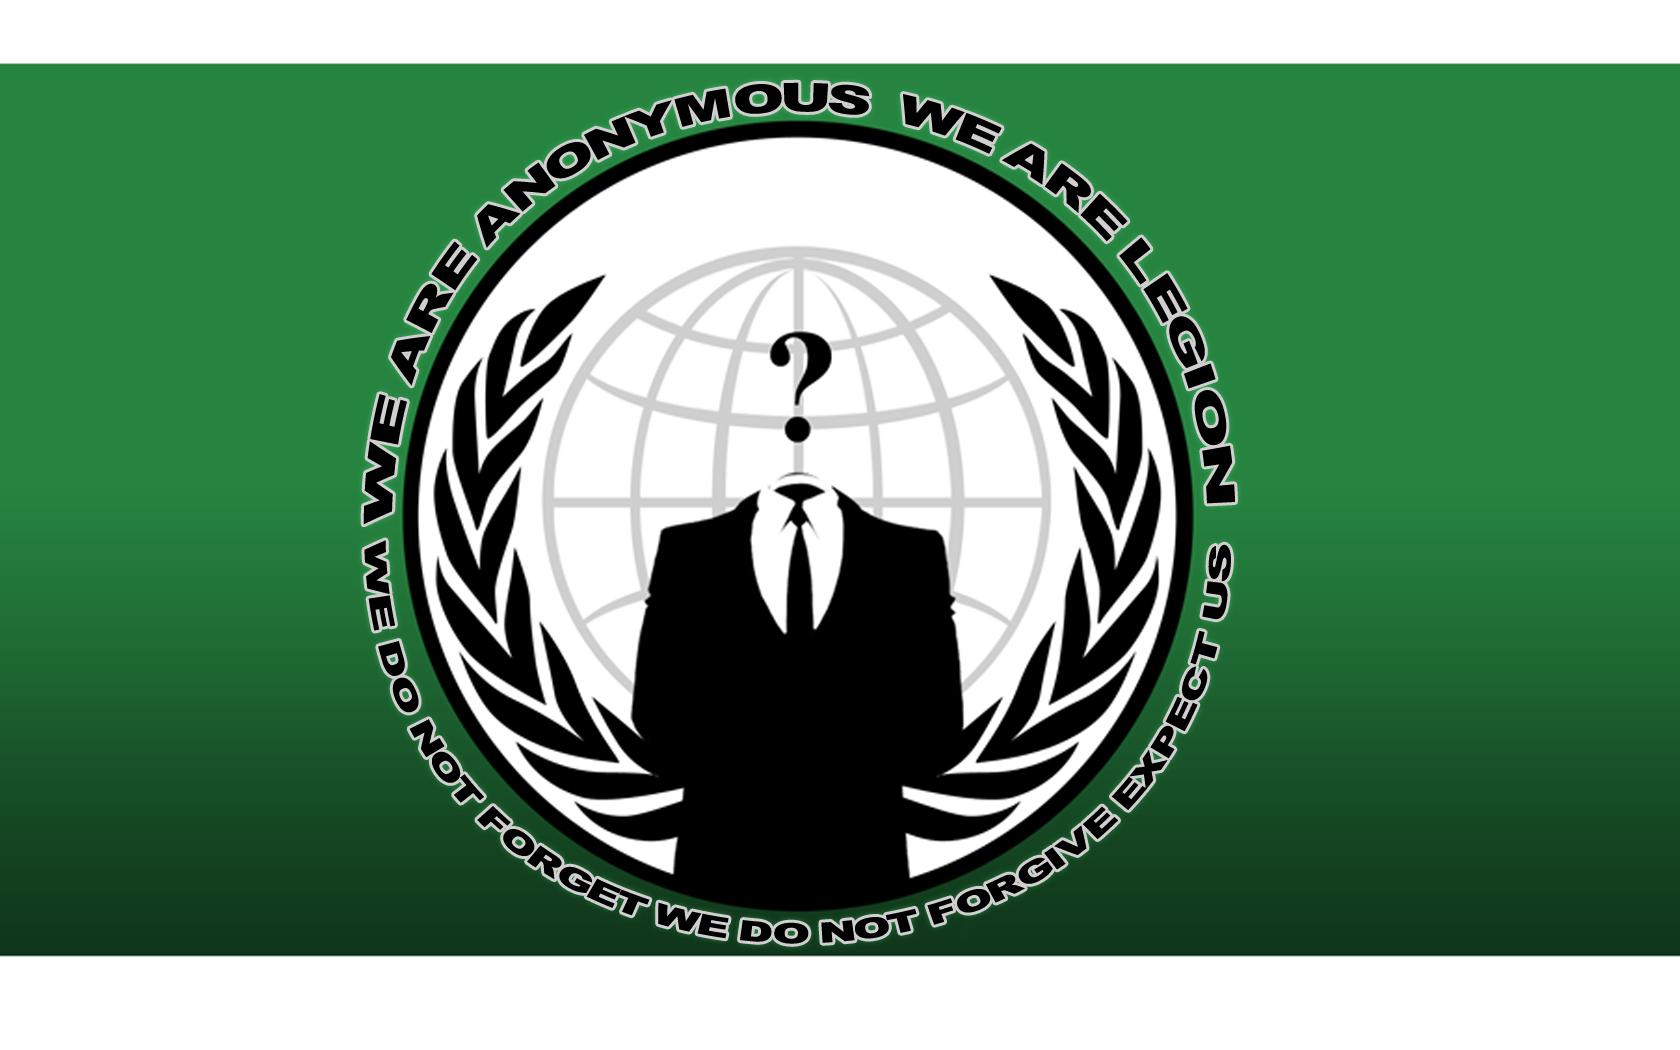 anonymous wallpaper 1680x1050